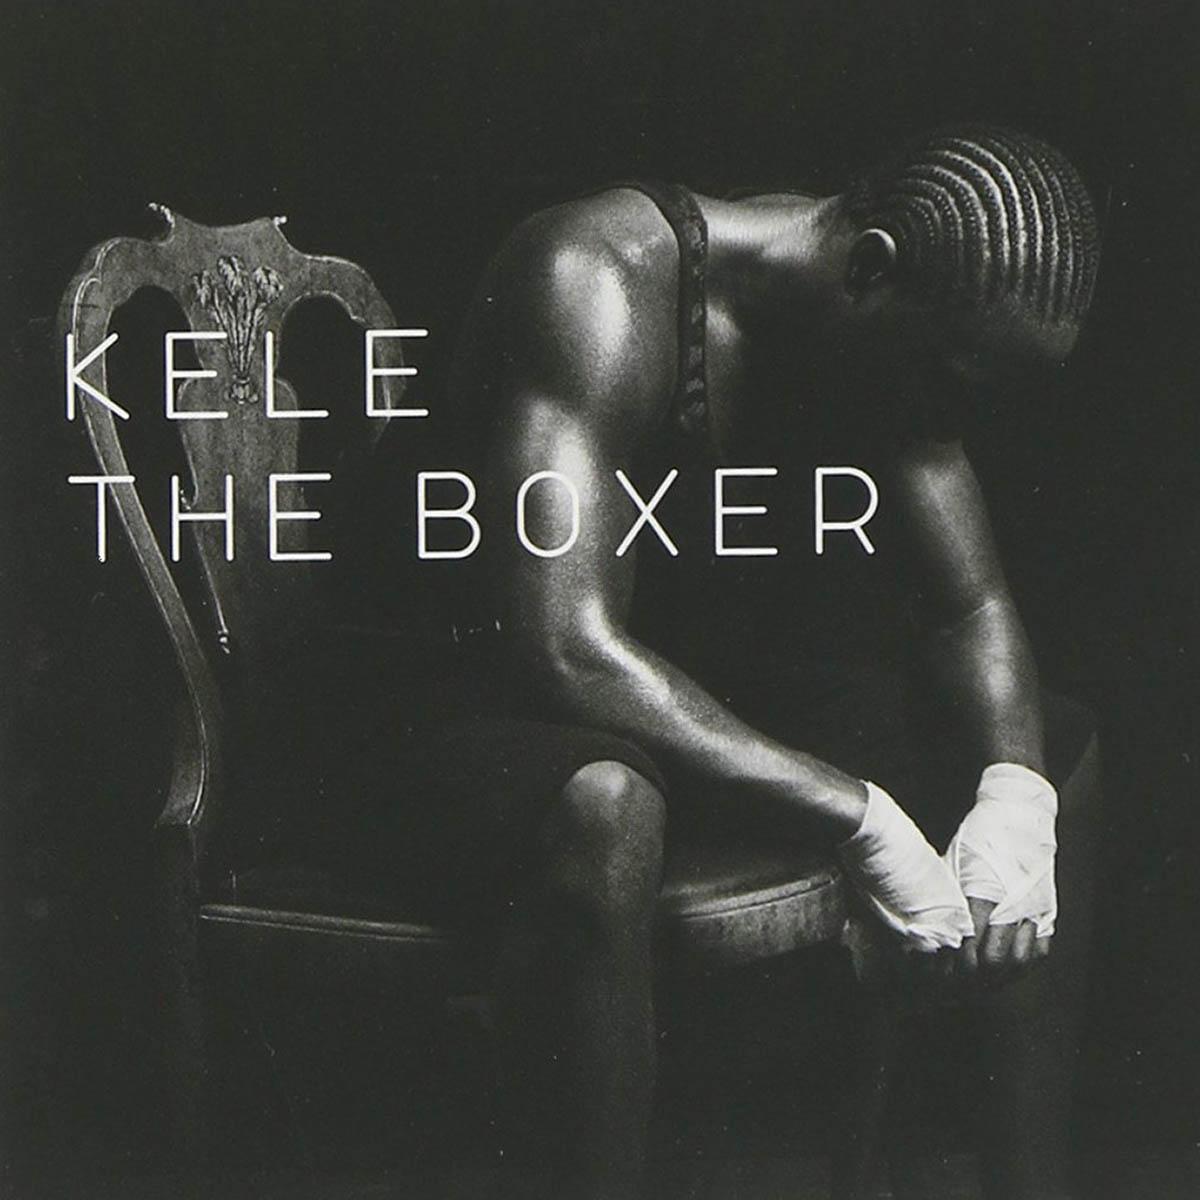 Kele, The Boxer